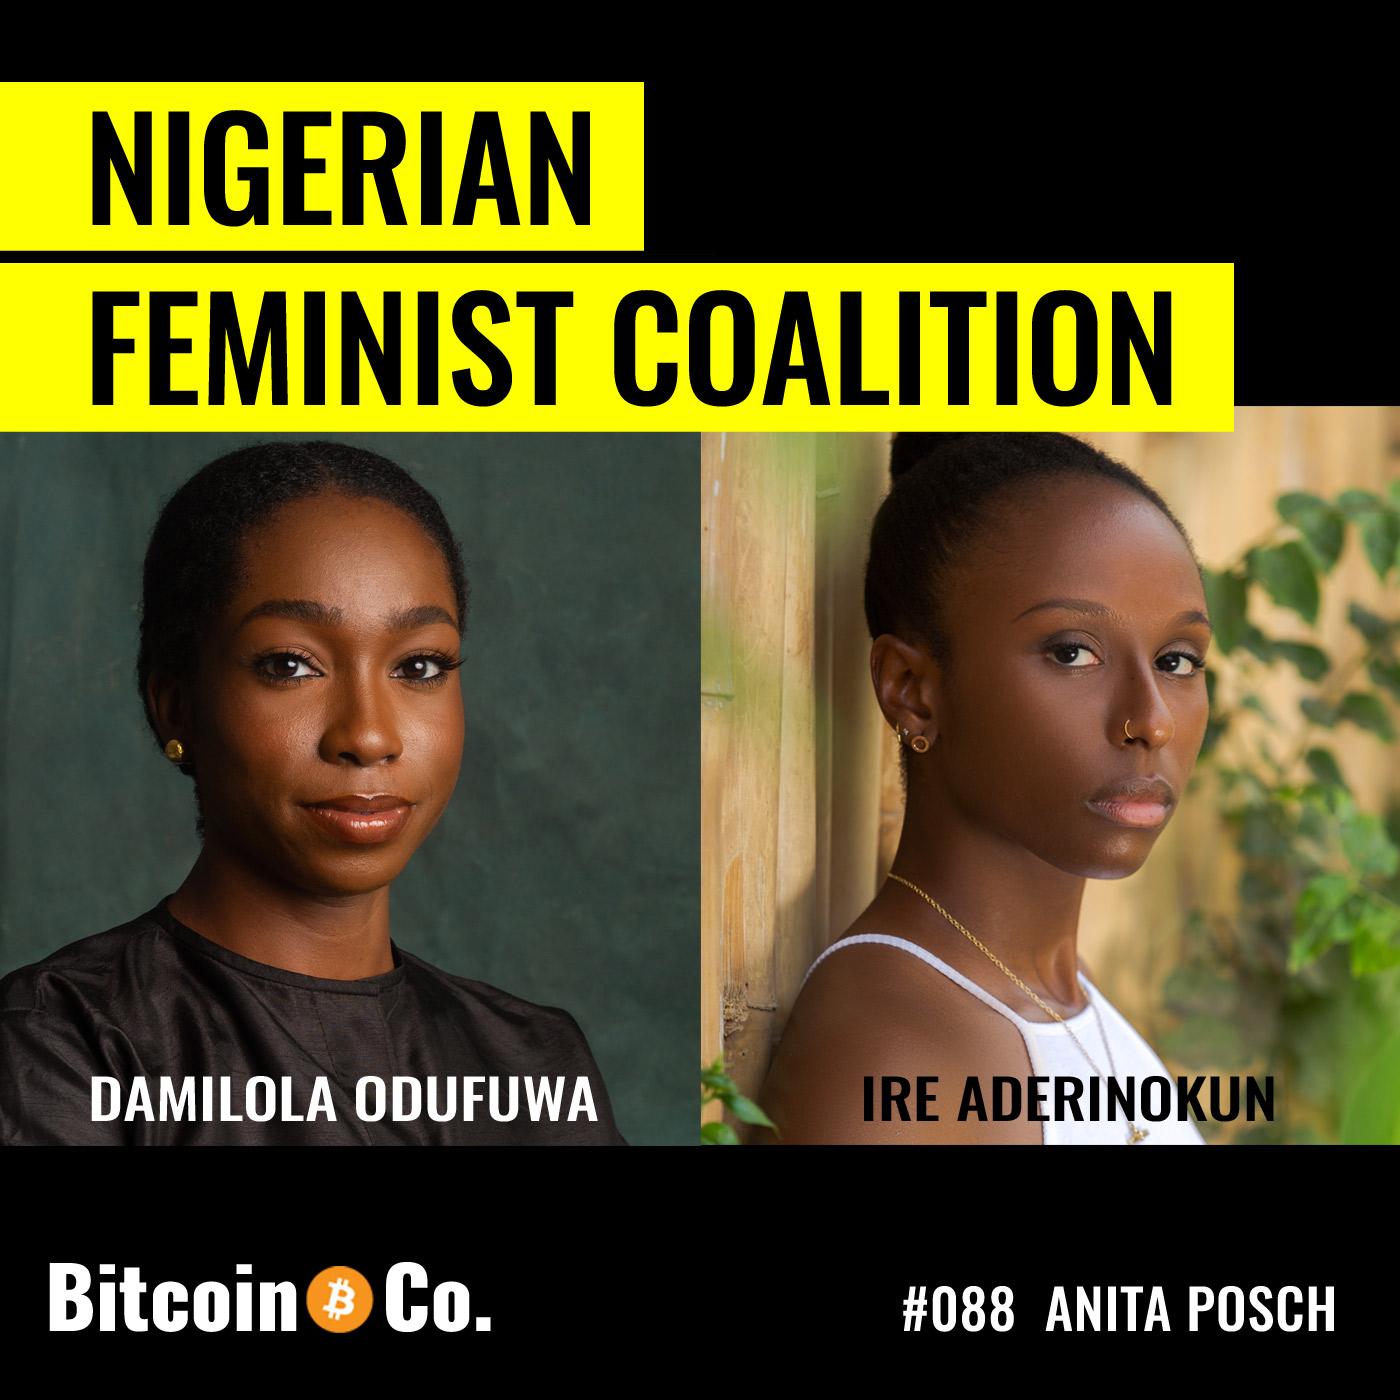 Nigerian Feminist Coalition EndSARS